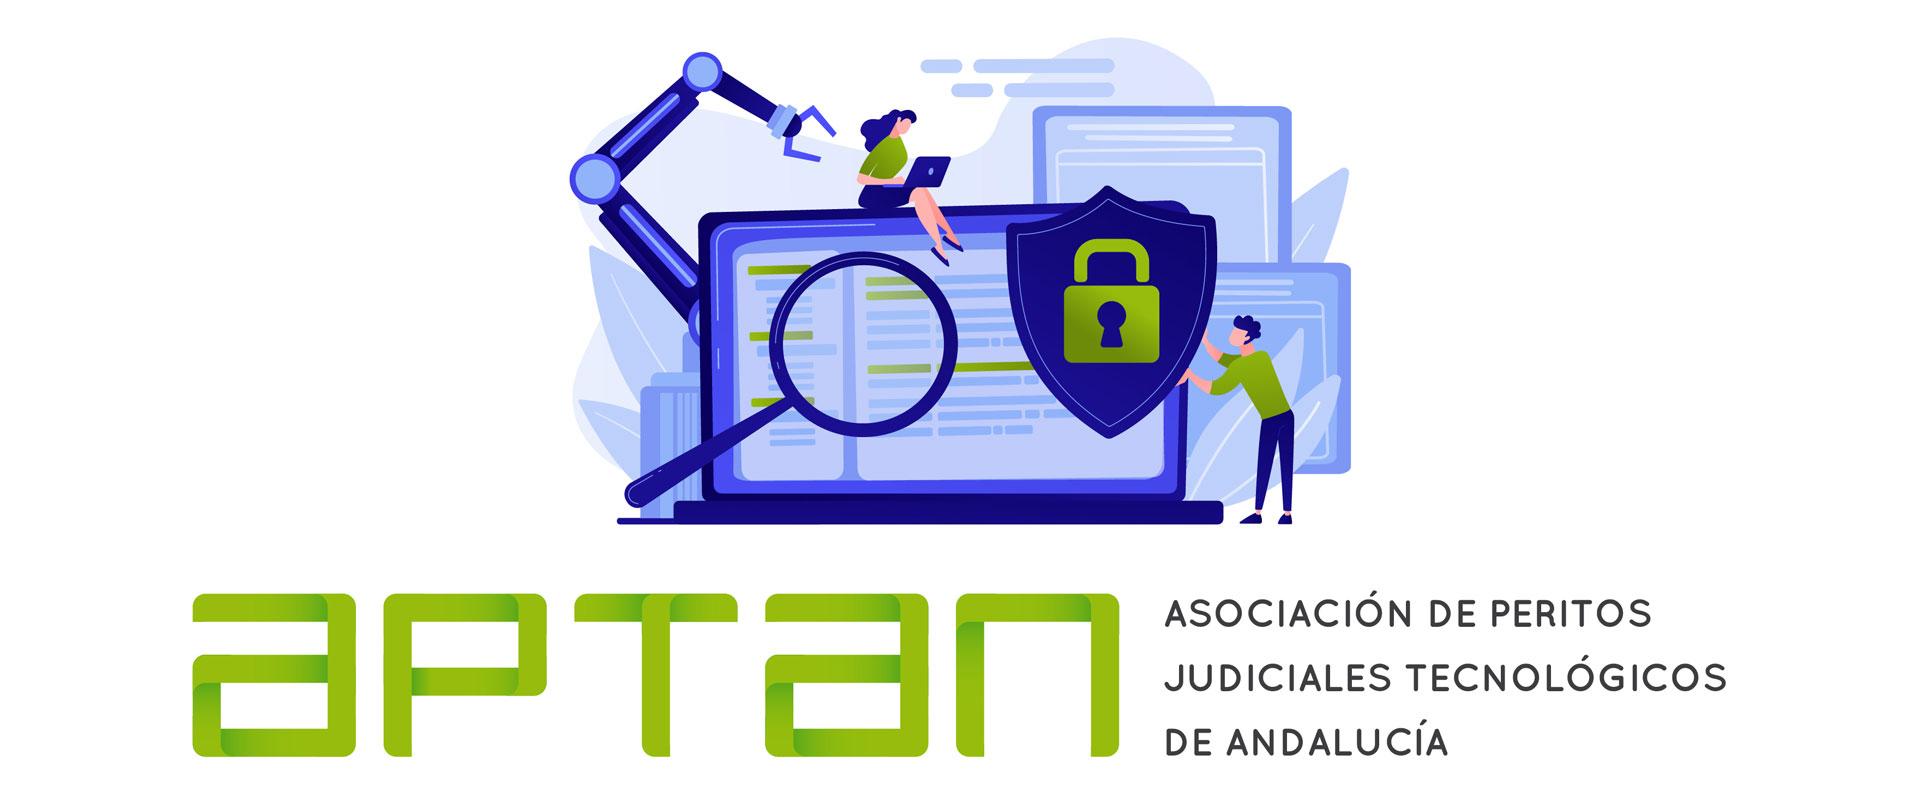 APTAN - Asociación de Peritos Judiciales de Andalucía